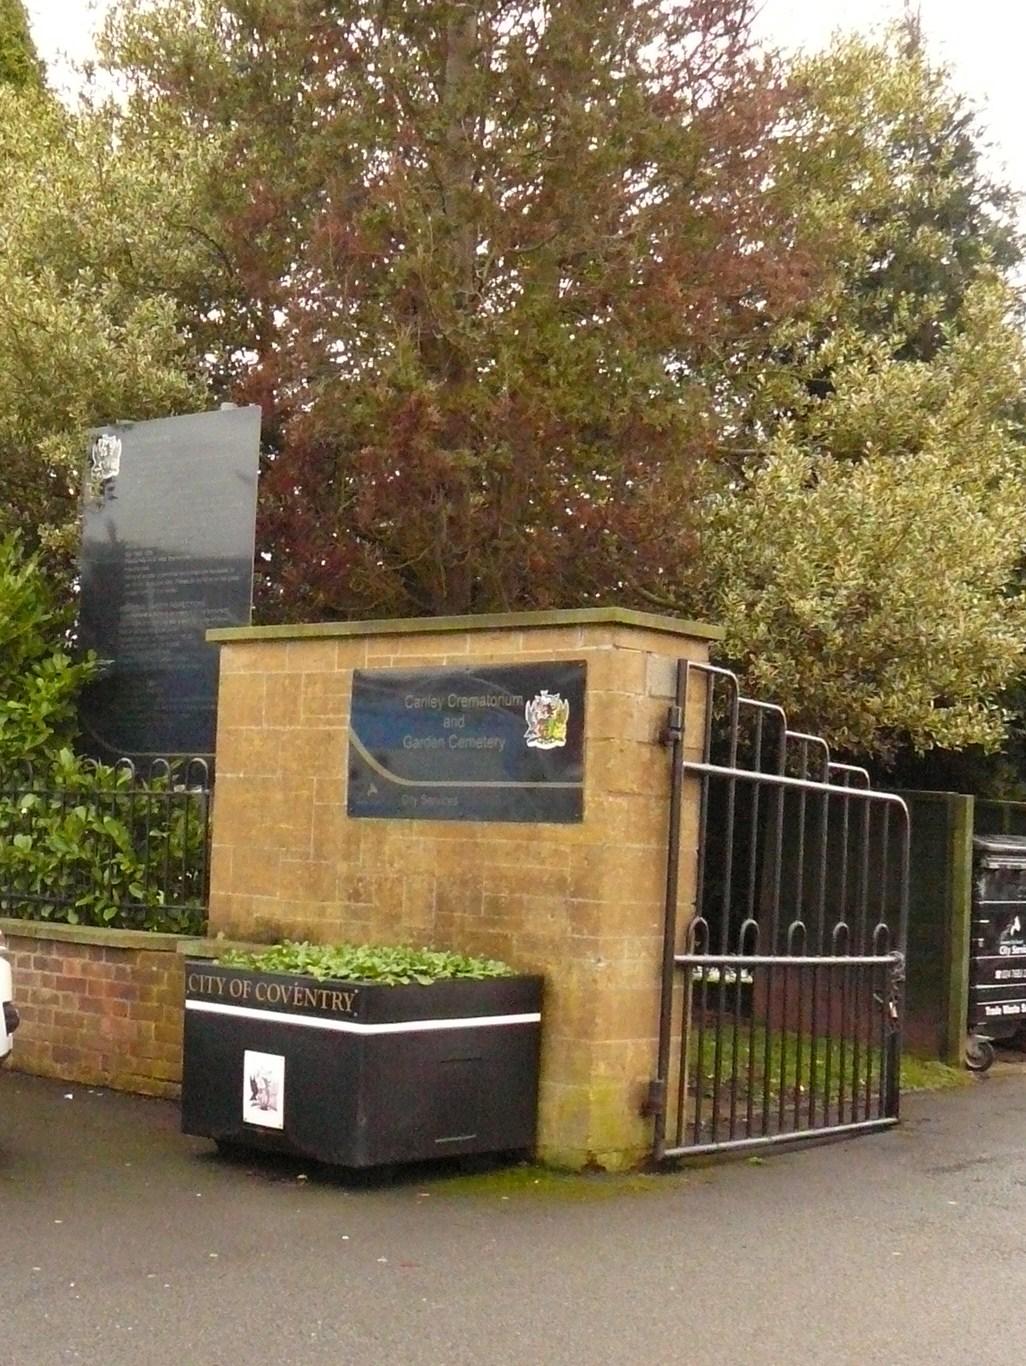 Canley Garden Cemetery and Crematorium